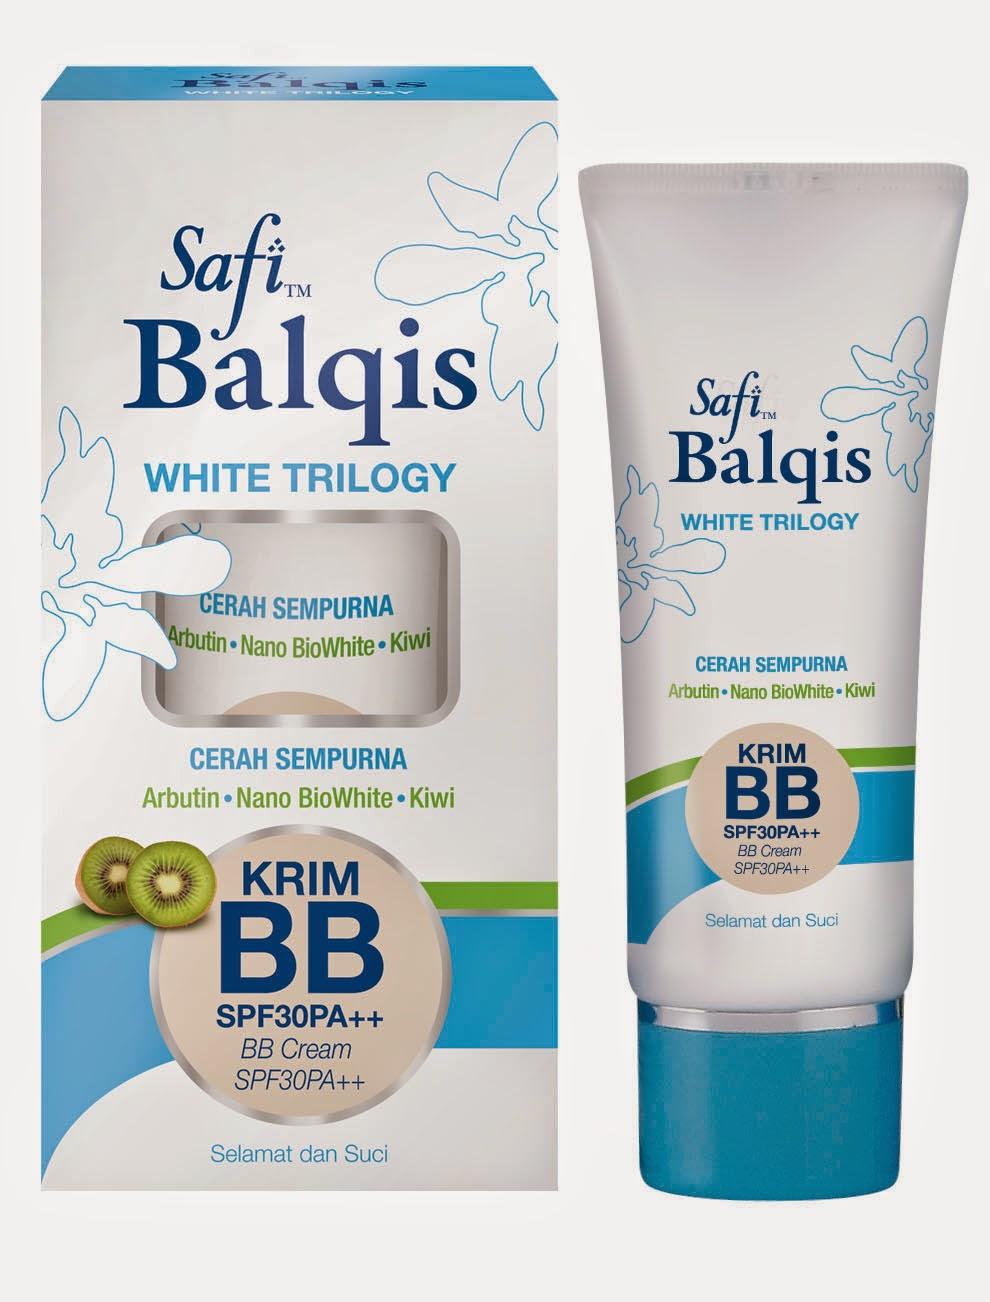 [Beauty Review] : Safi Balqis White Trilogy - Ayue Idris